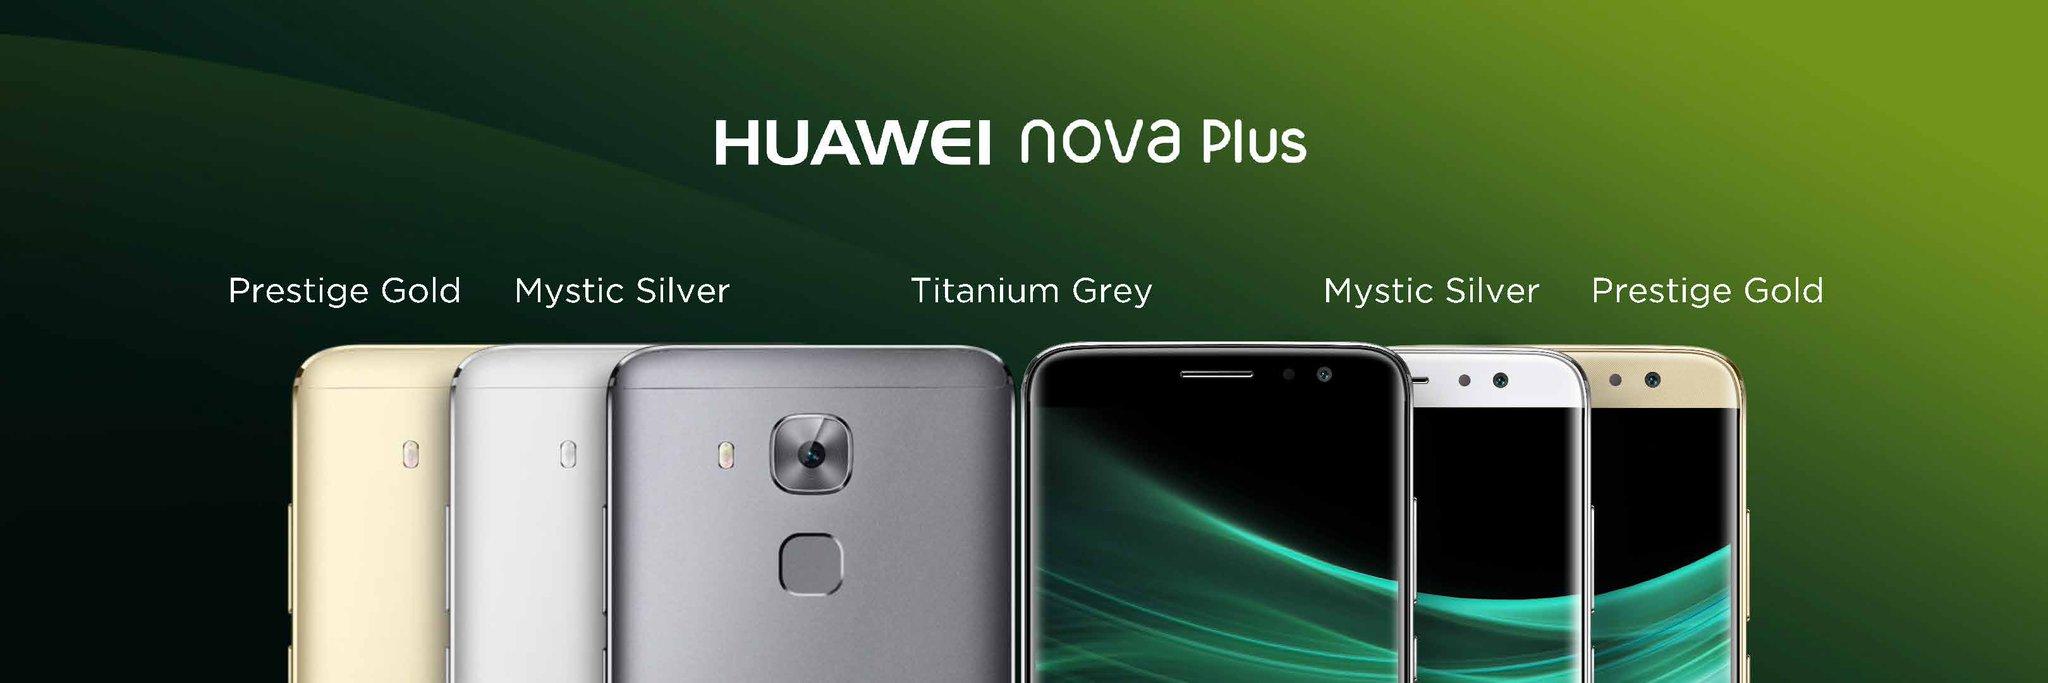 huawew nova plus CrQbv6rW8AAtBt1